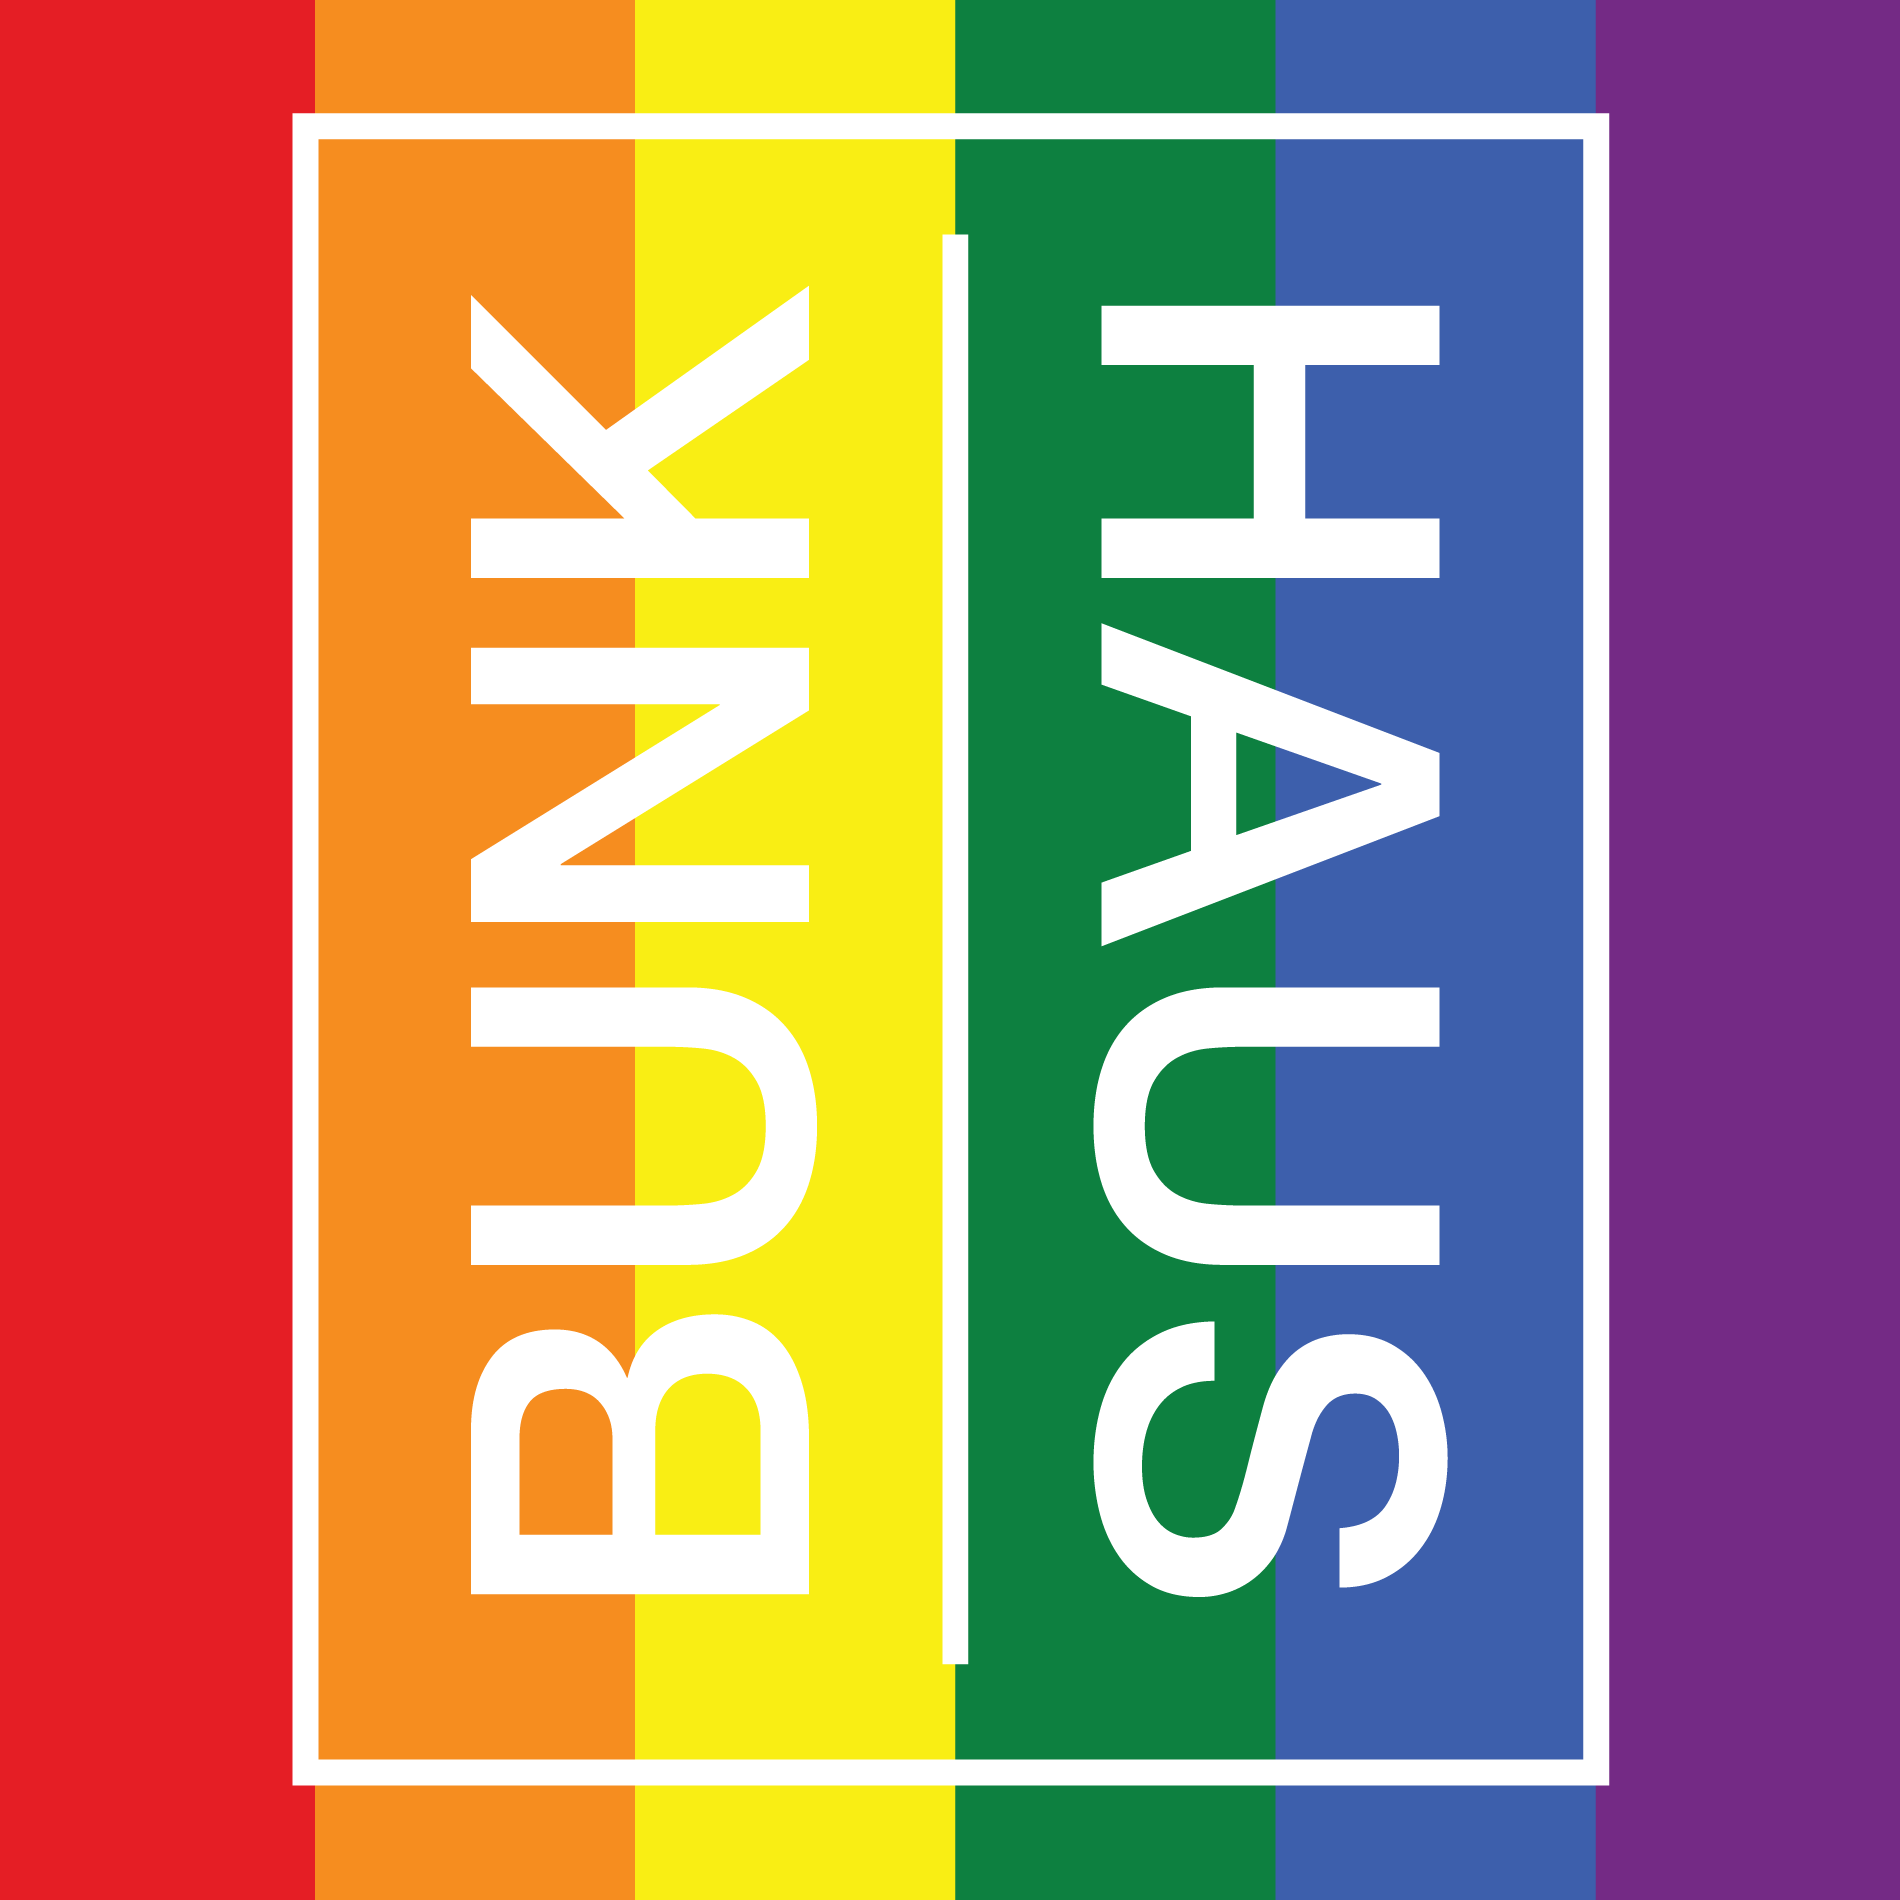 Bunk-Haus-logo---pride.png